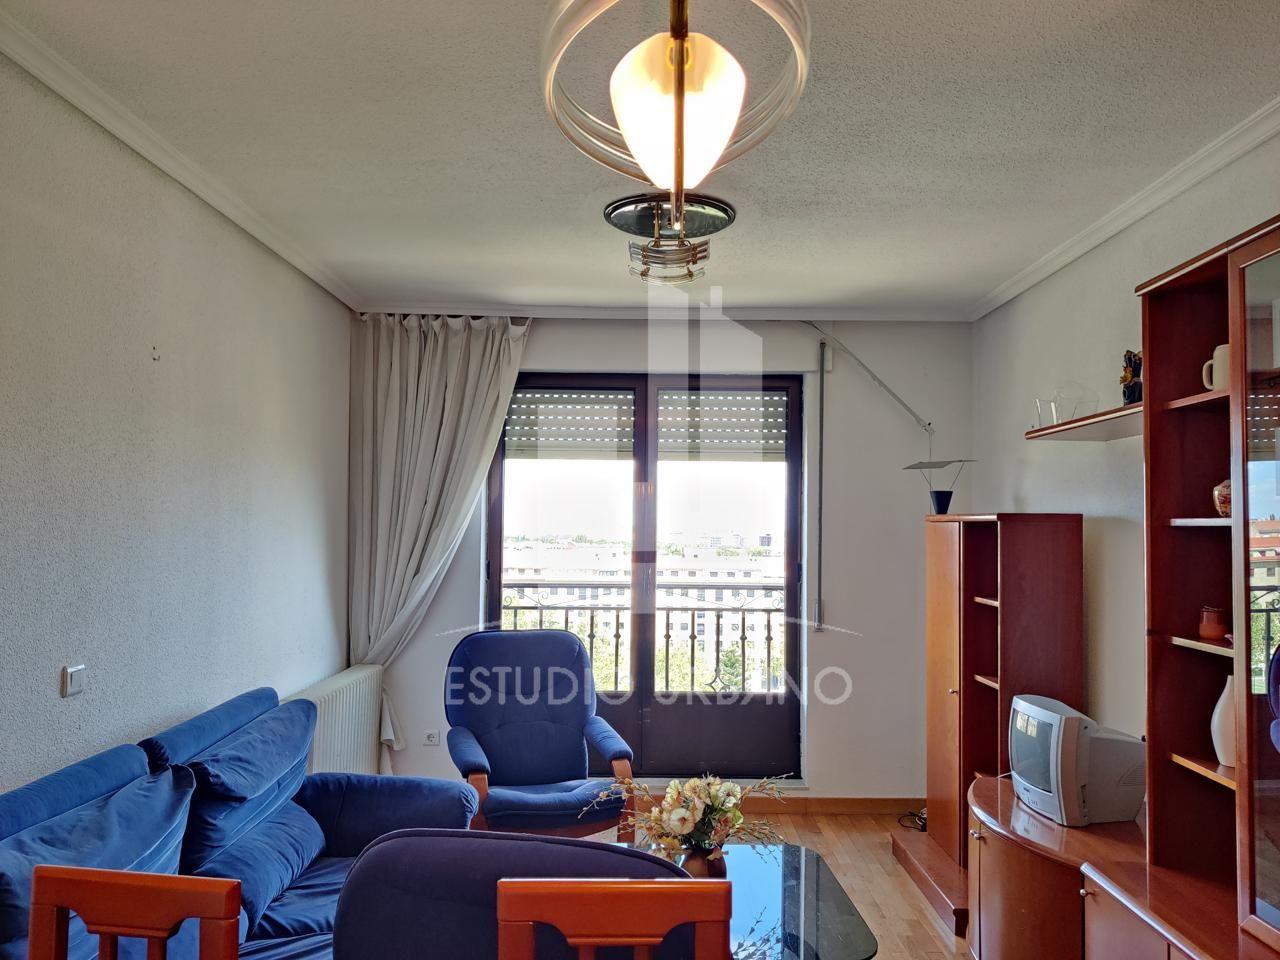 pisos en salamanca · calle-riano-37006 550€